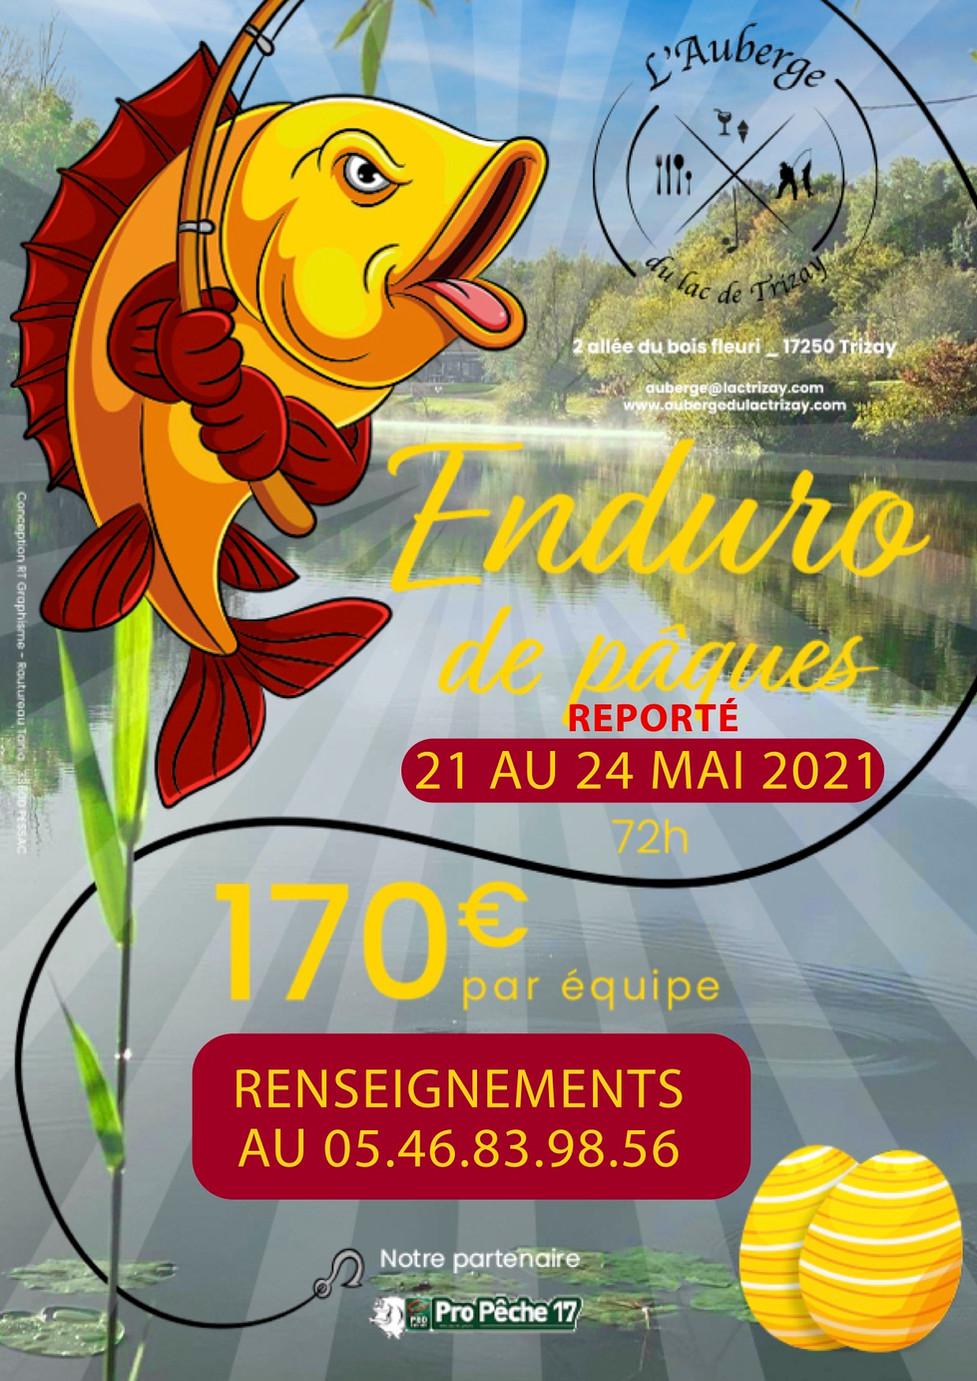 Affiche enduro pâques 2021 REPORTE.jpg